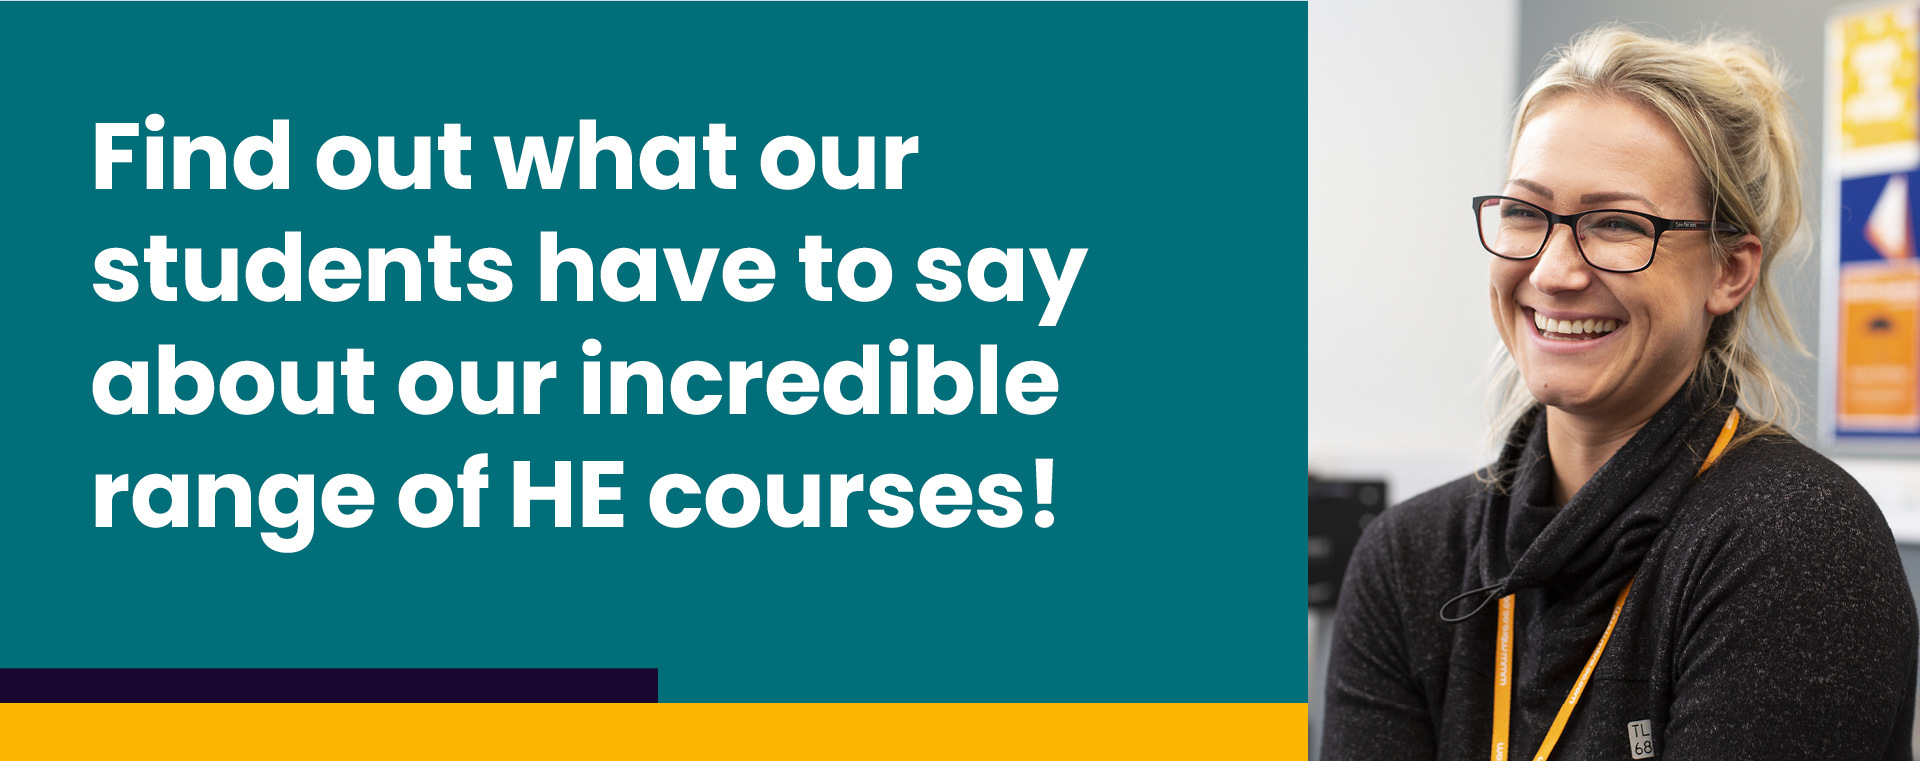 MC higher education courses